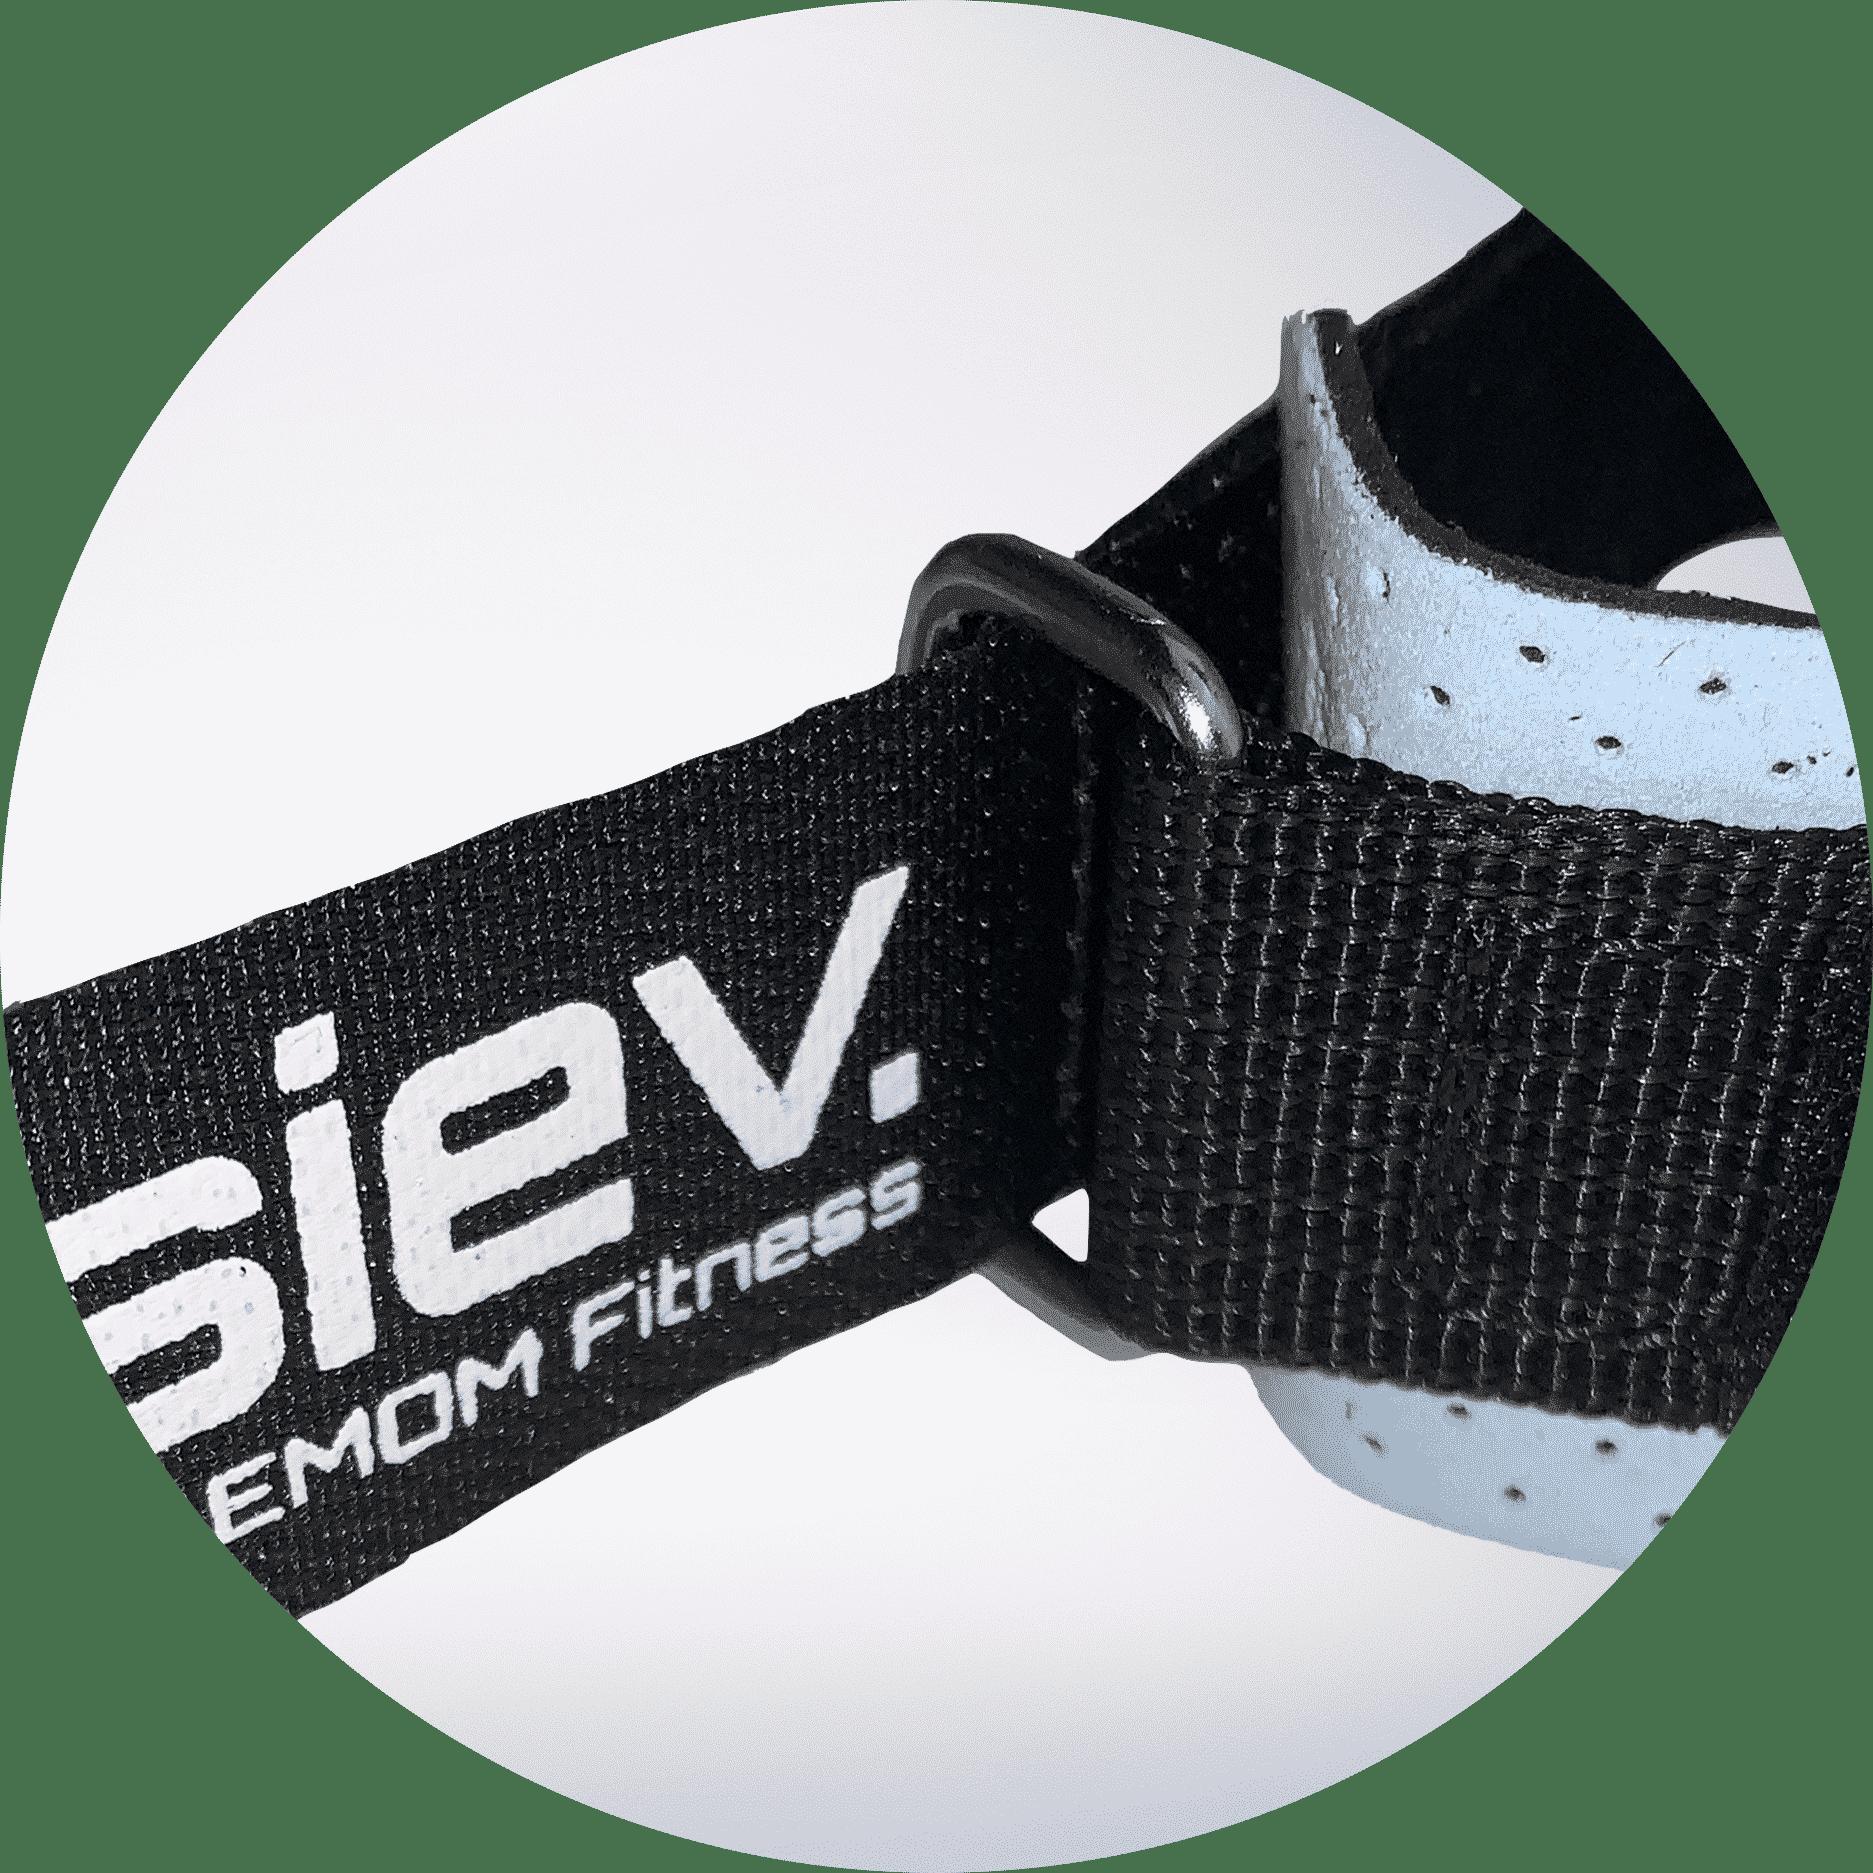 siev.Grips- Grips 2H - Premium Hand Grips 10